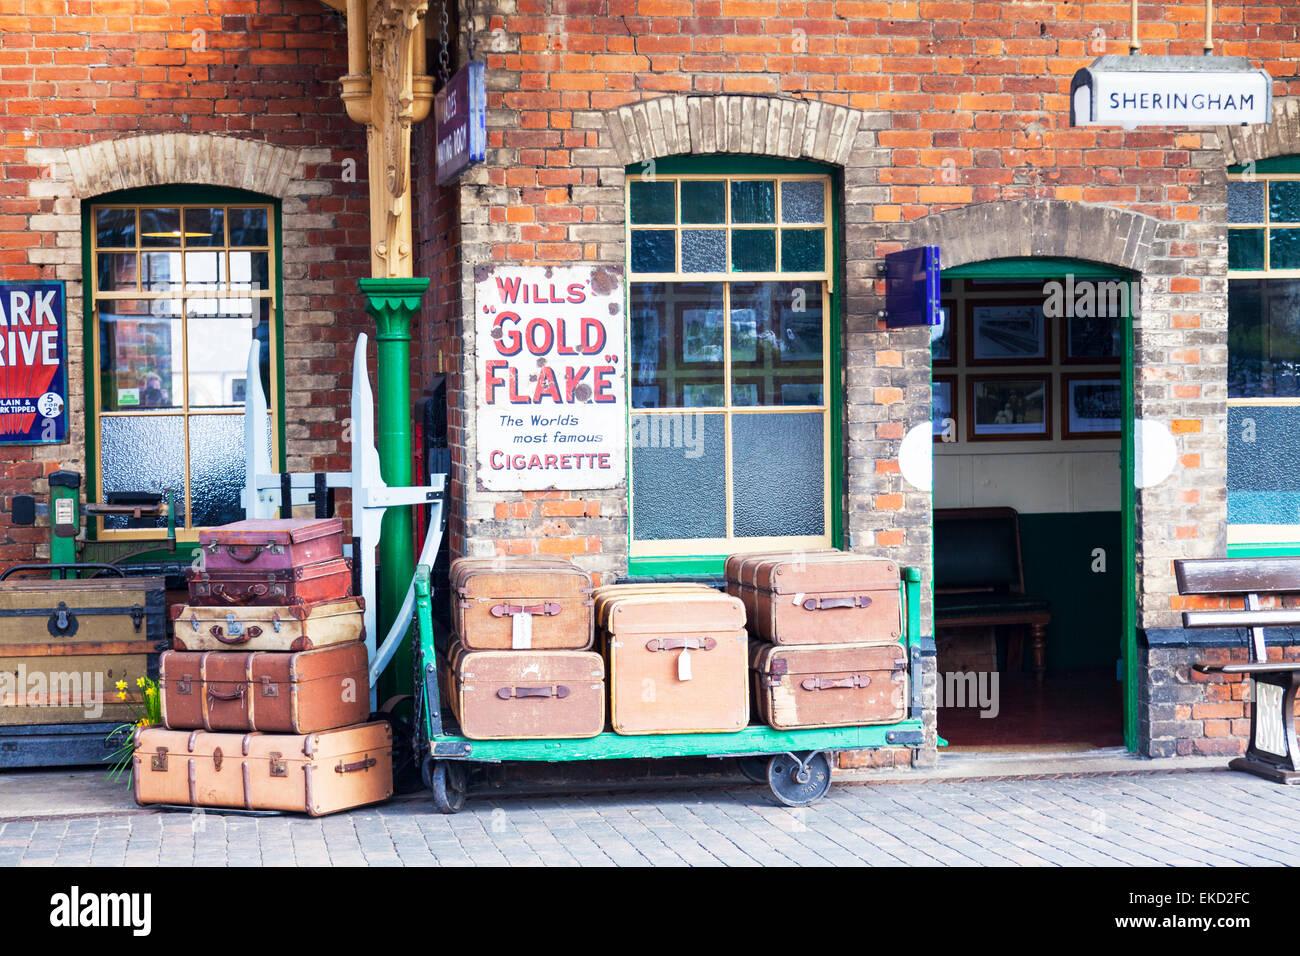 Luggage on yesteryear's, Sheringham railway station, North Norfolk, UK cases old platform travel trunks - Stock Image